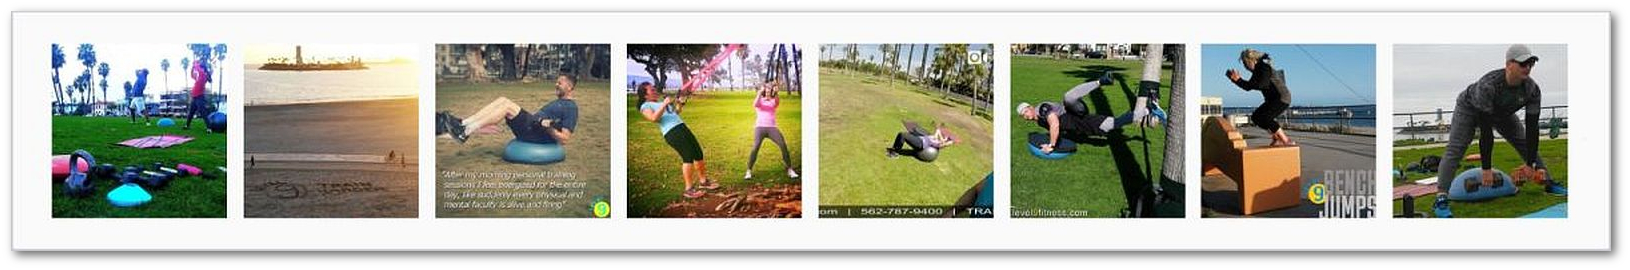 Personal Training in Long Beach California - Pics